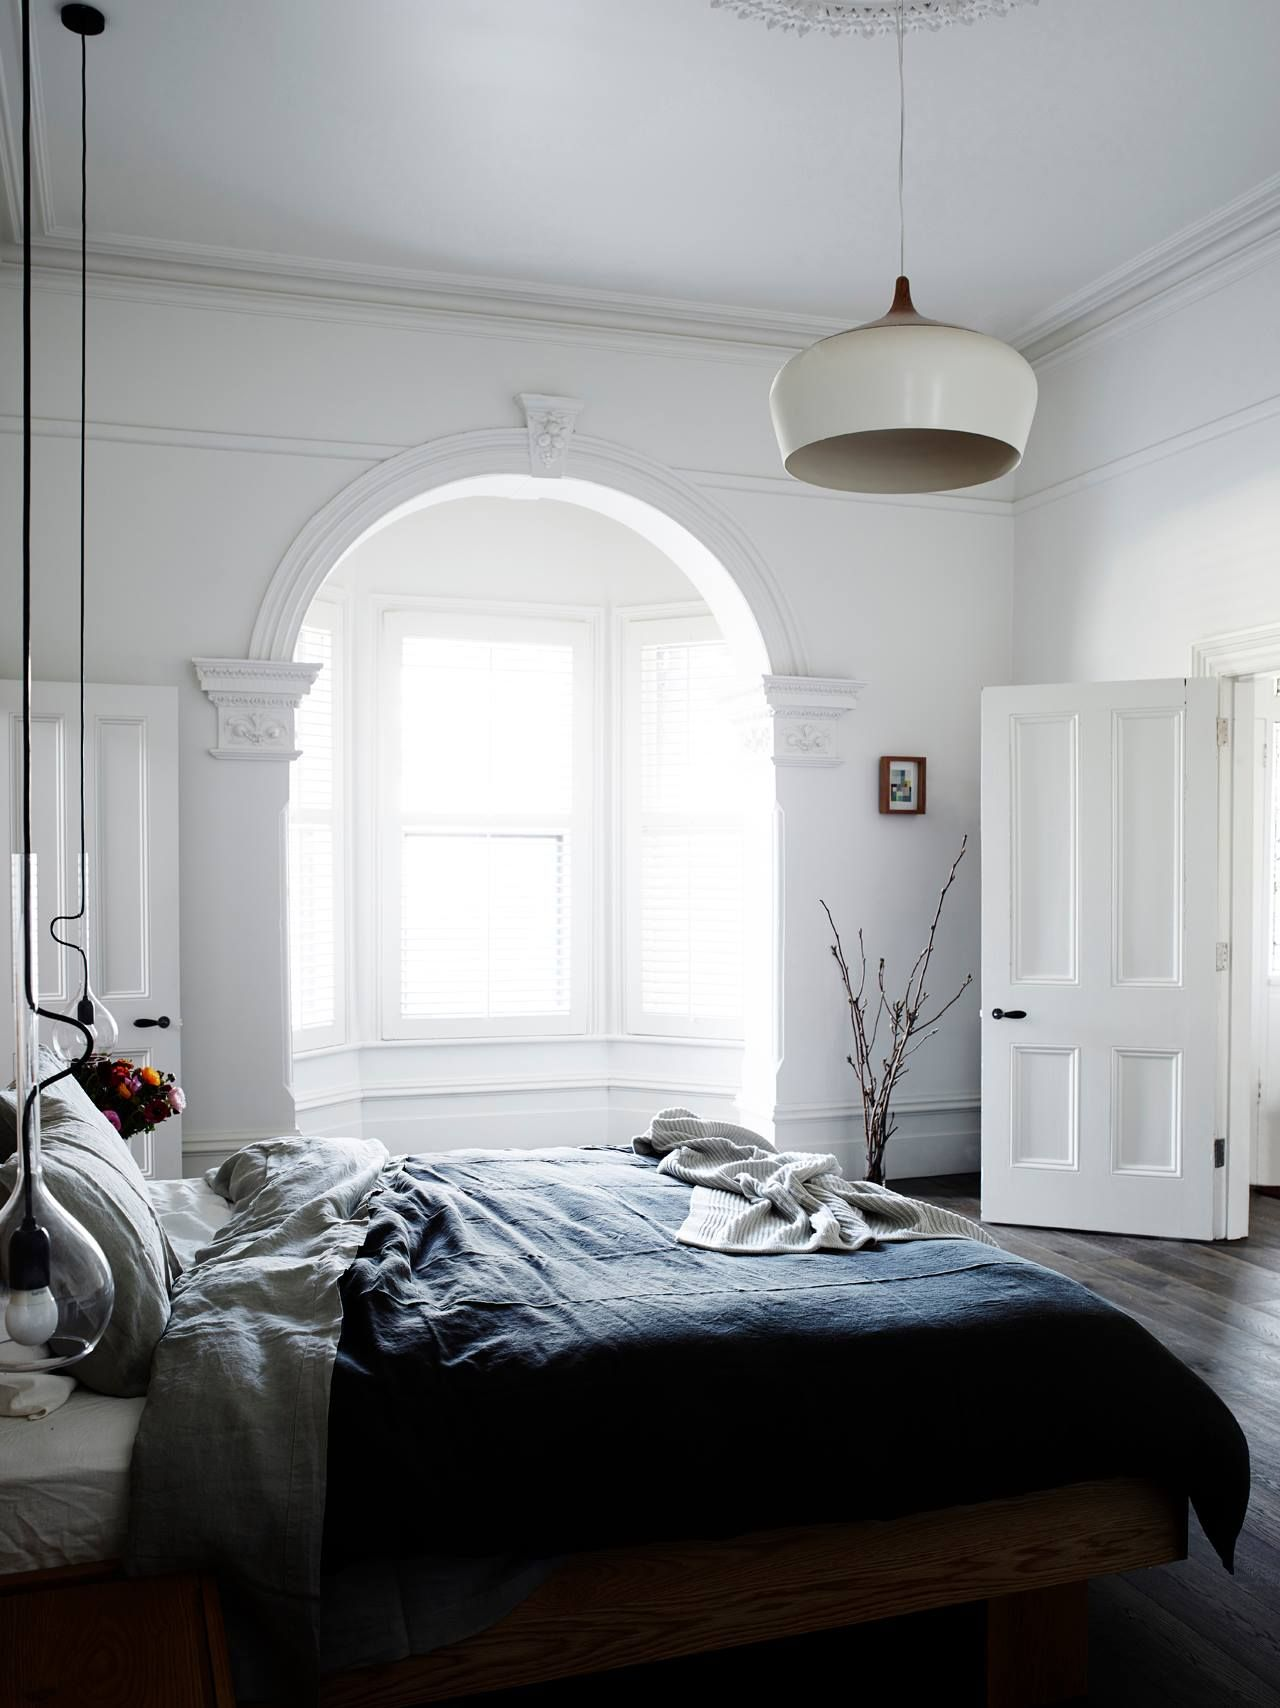 5 Cozy Bedrooms We D Never Leave